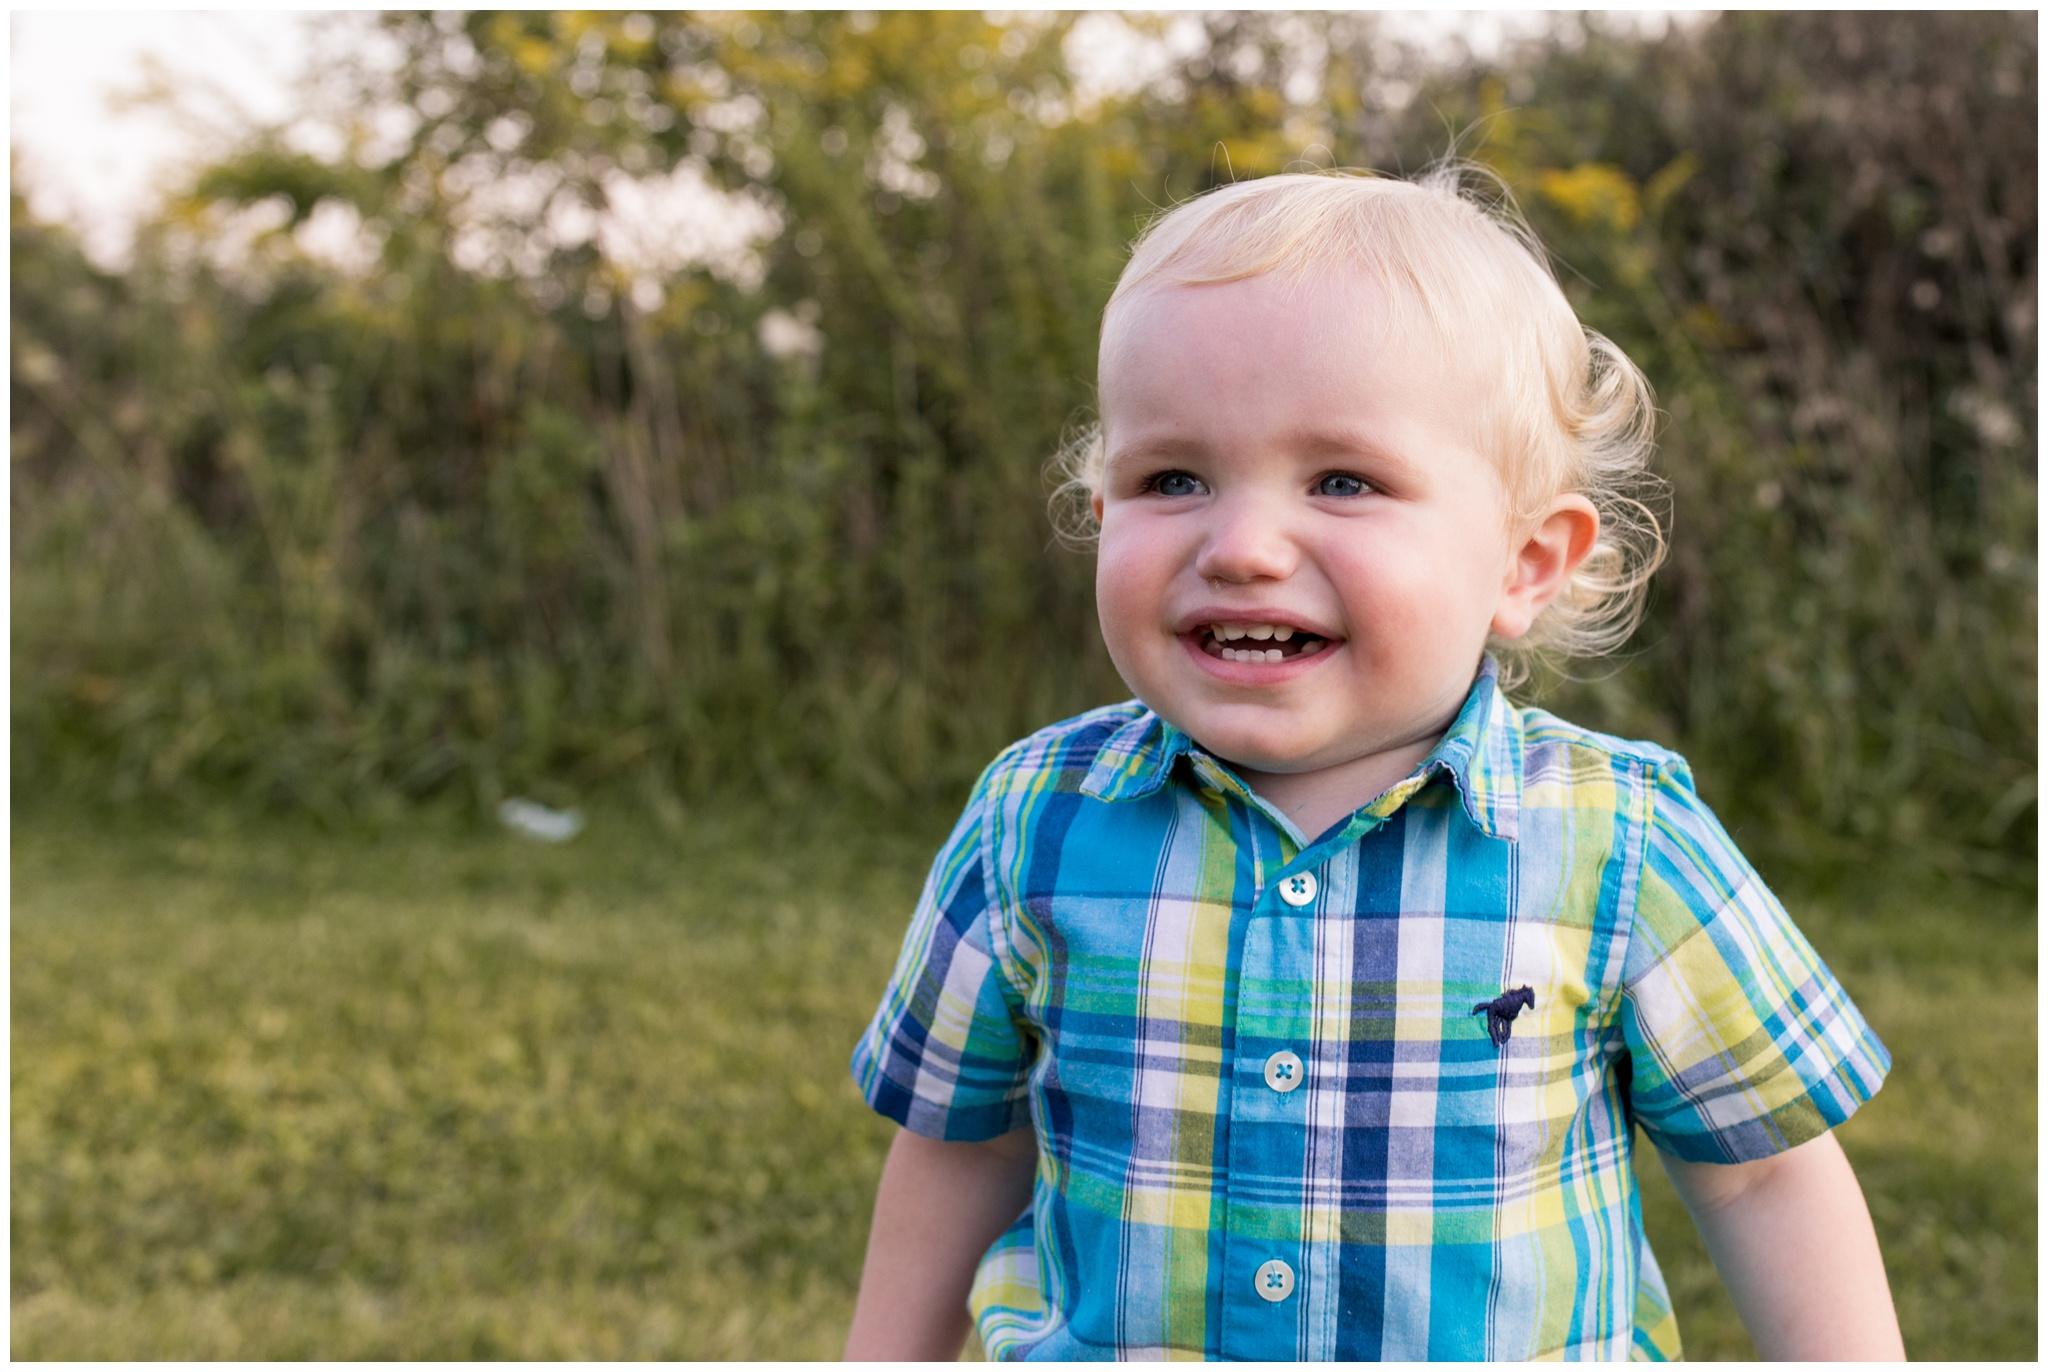 little boy smiling during family photos at Wildcat Creek Reservoir Park in Kokomo Indiana